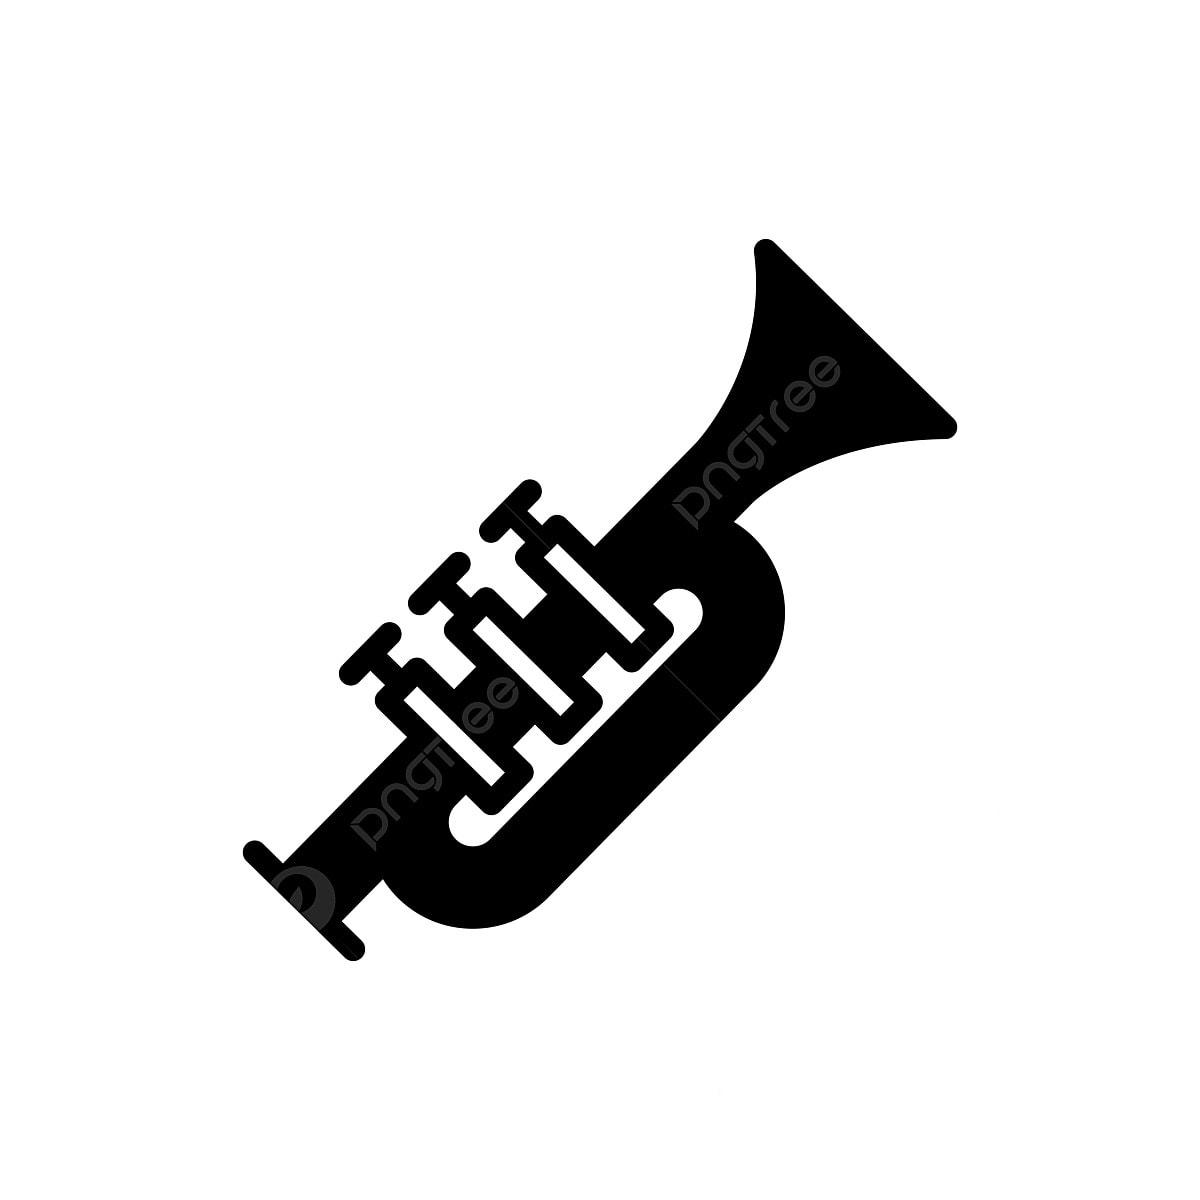 Trumpet Silhouette Vector Download 12 Trumpet Vectors | Silhouette vector,  Silhouette clip art, Music silhouette